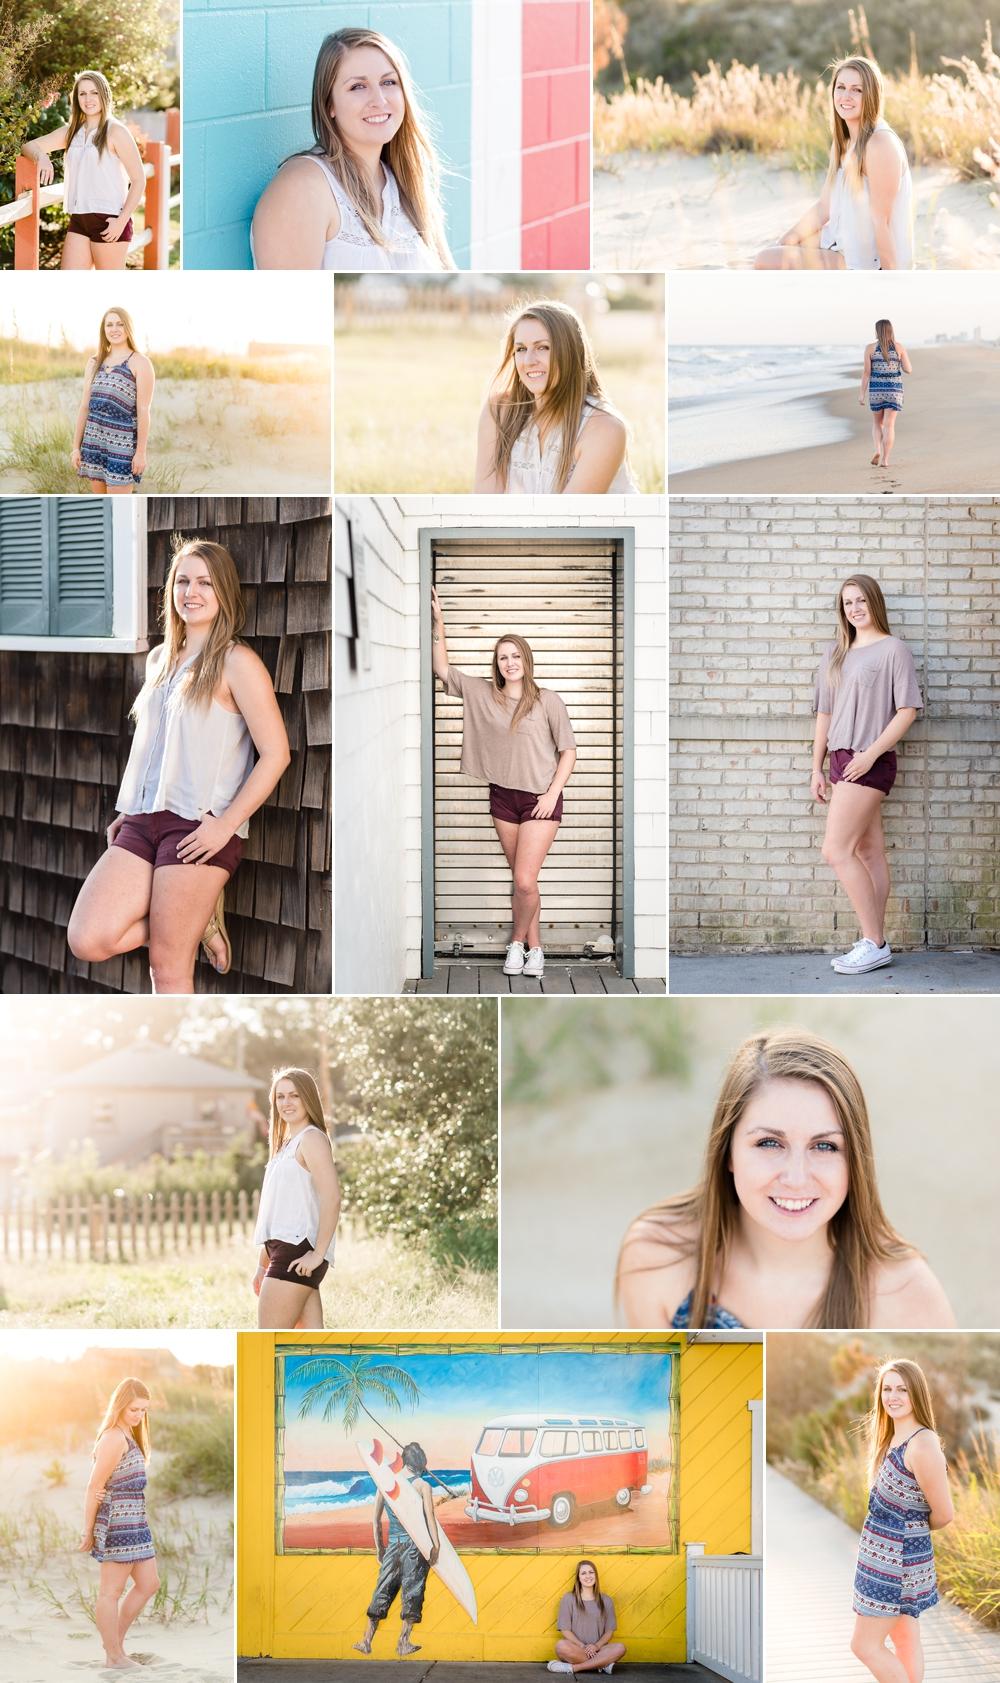 high school senior pictures, virginia beach senior portrait photographer, senior photographs